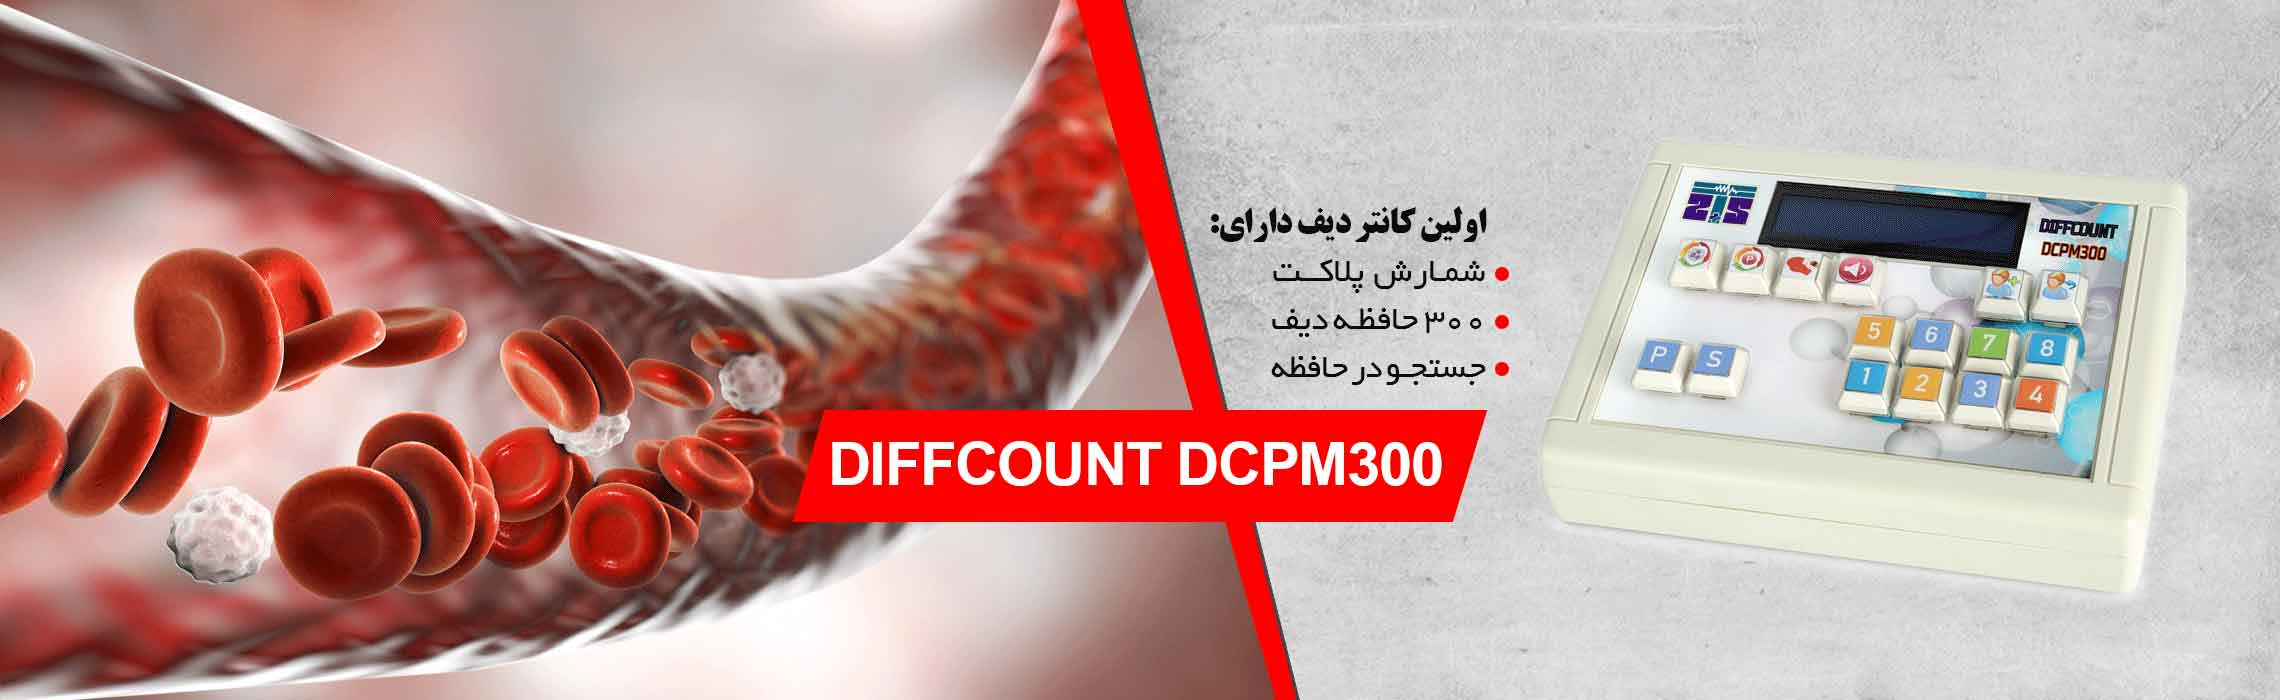 Diffcounter|ساخت شرکت زبدگان طب و صنعت سحر